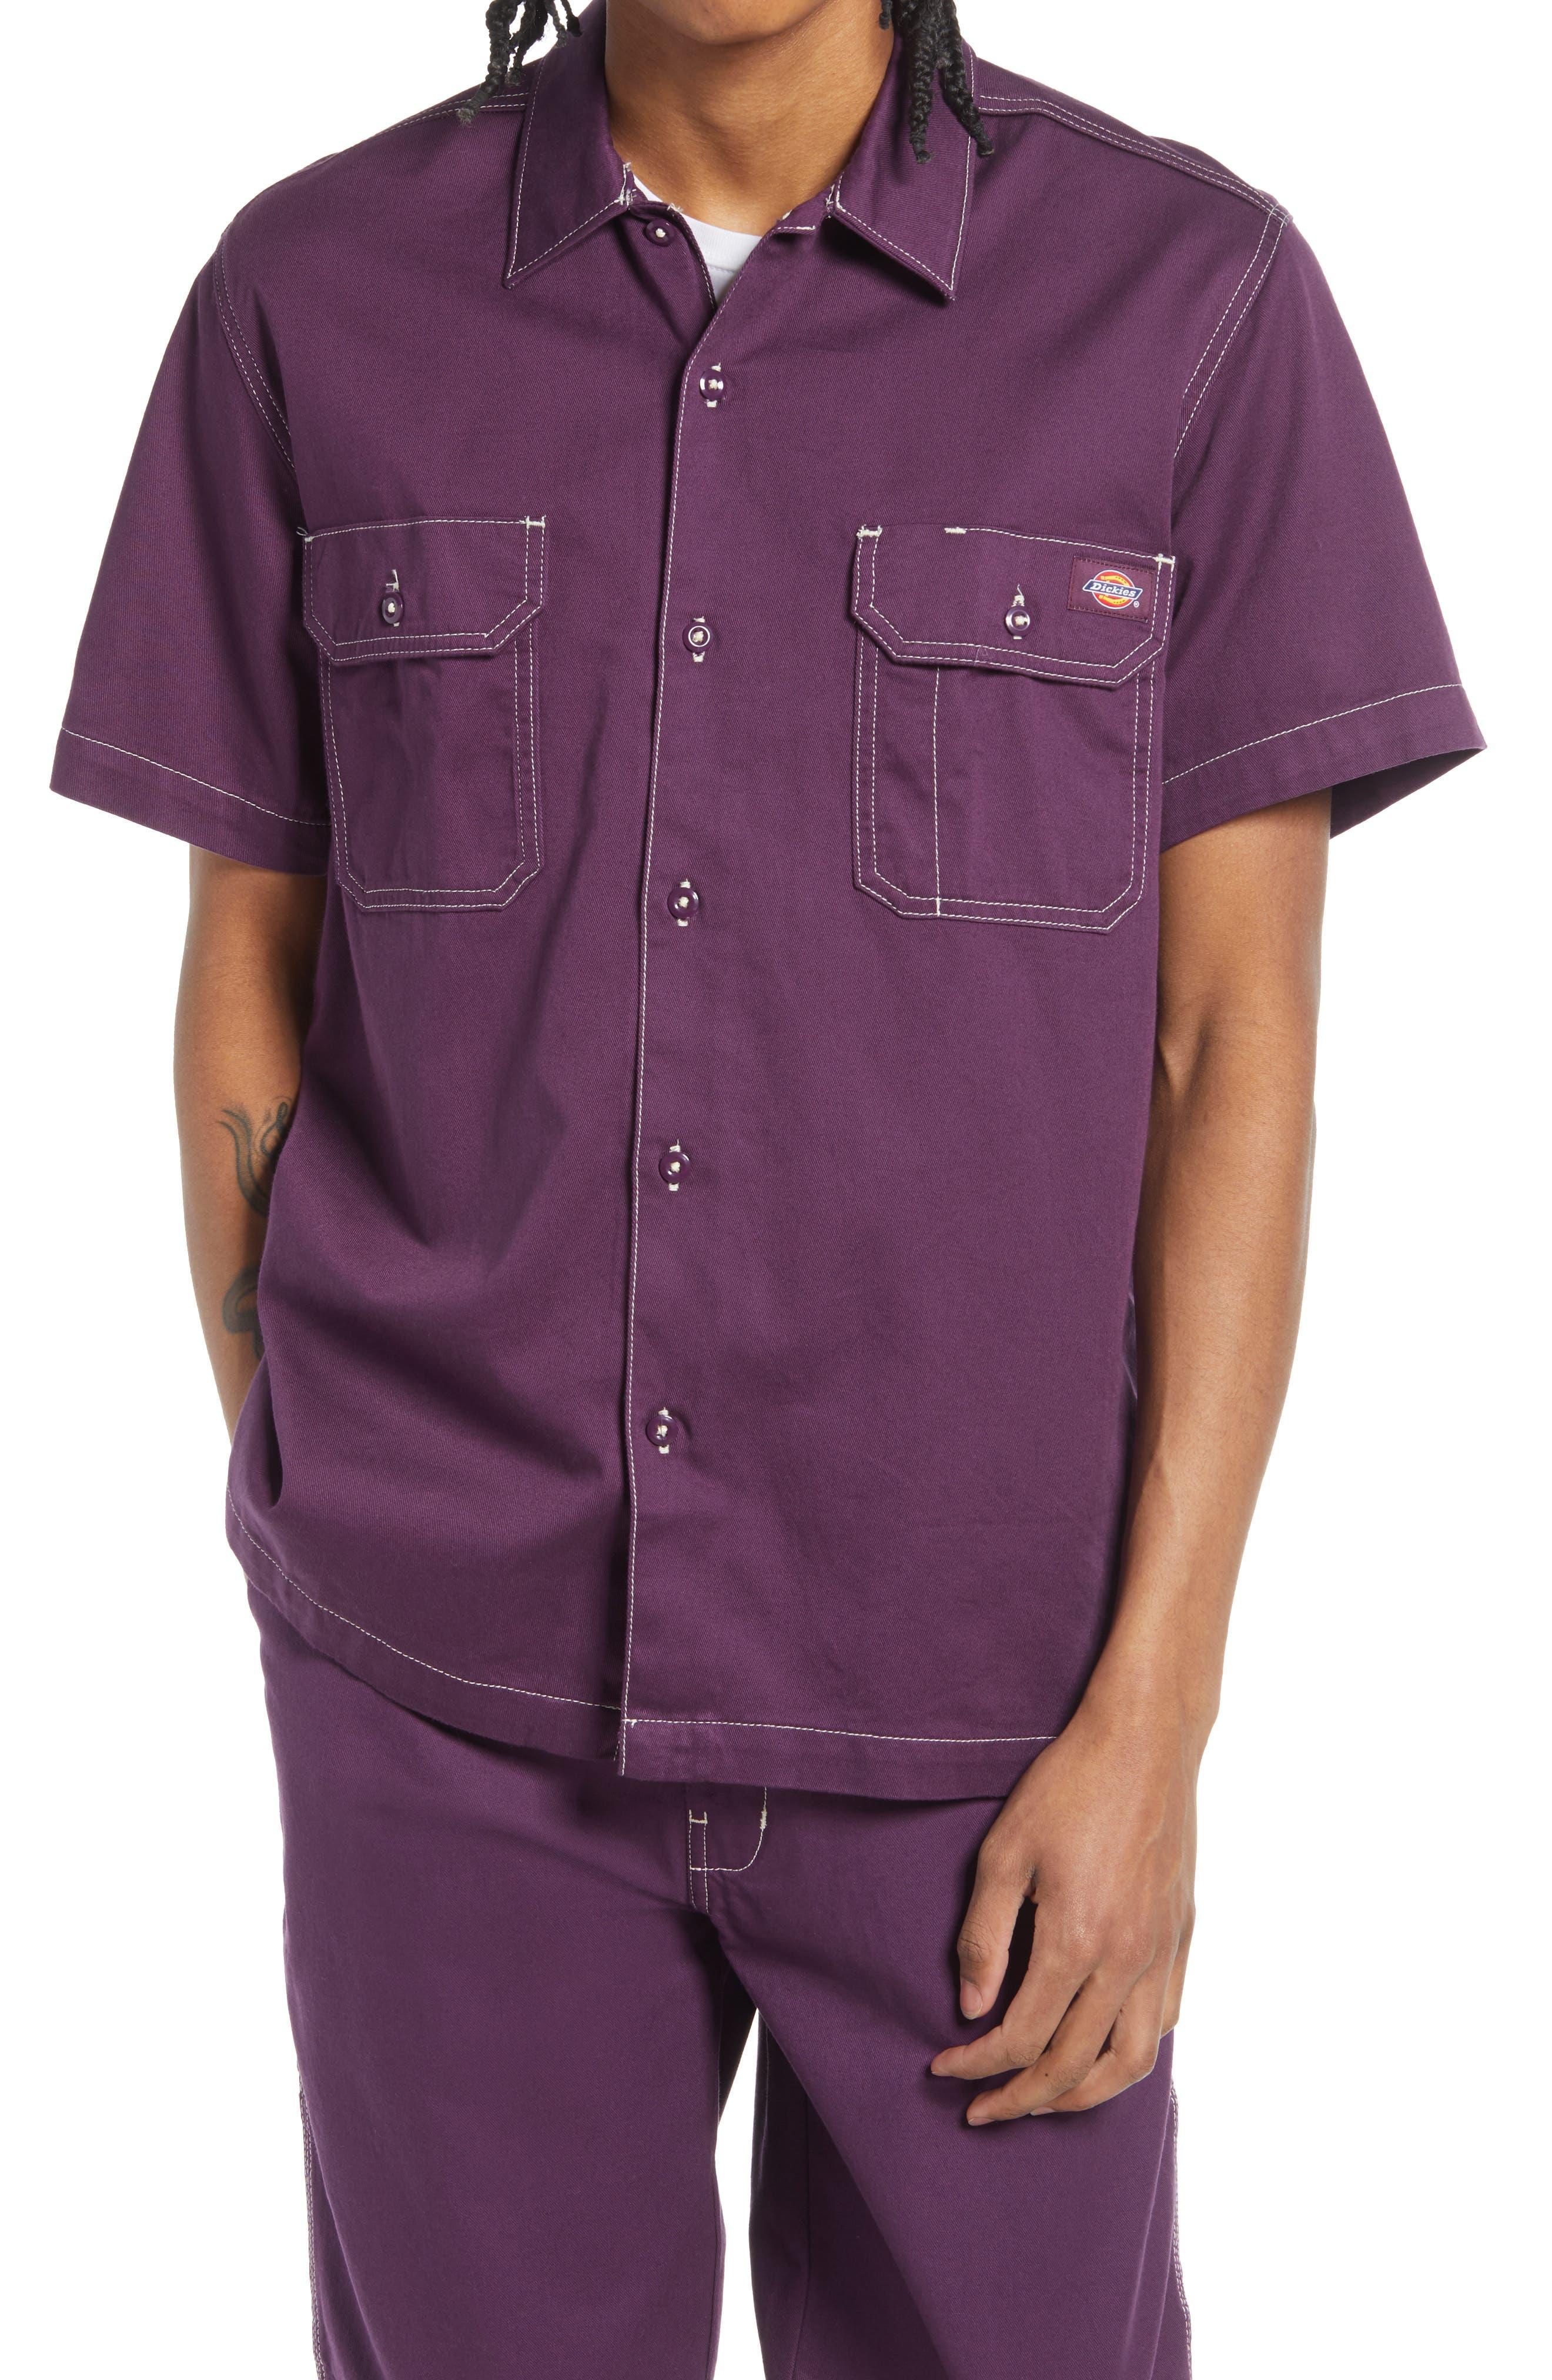 R2R Short Sleeve Work Shirt